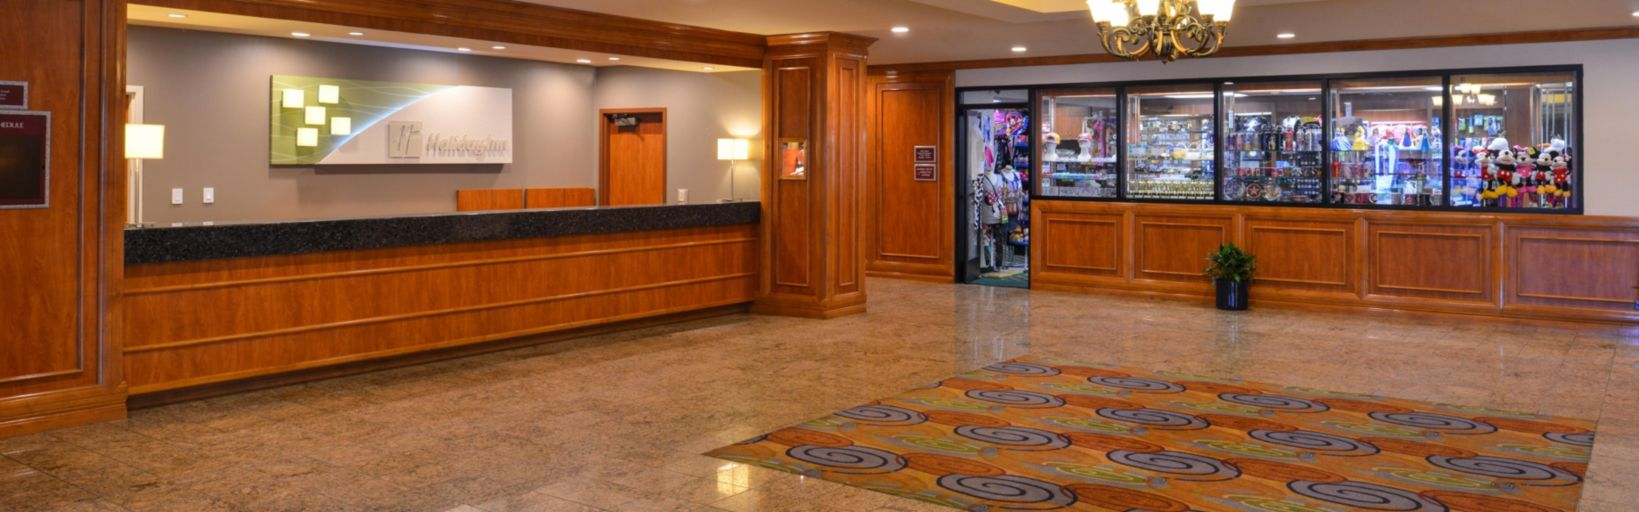 La Mirada Hotel - Holiday Inn La Mirada, CA Hotel